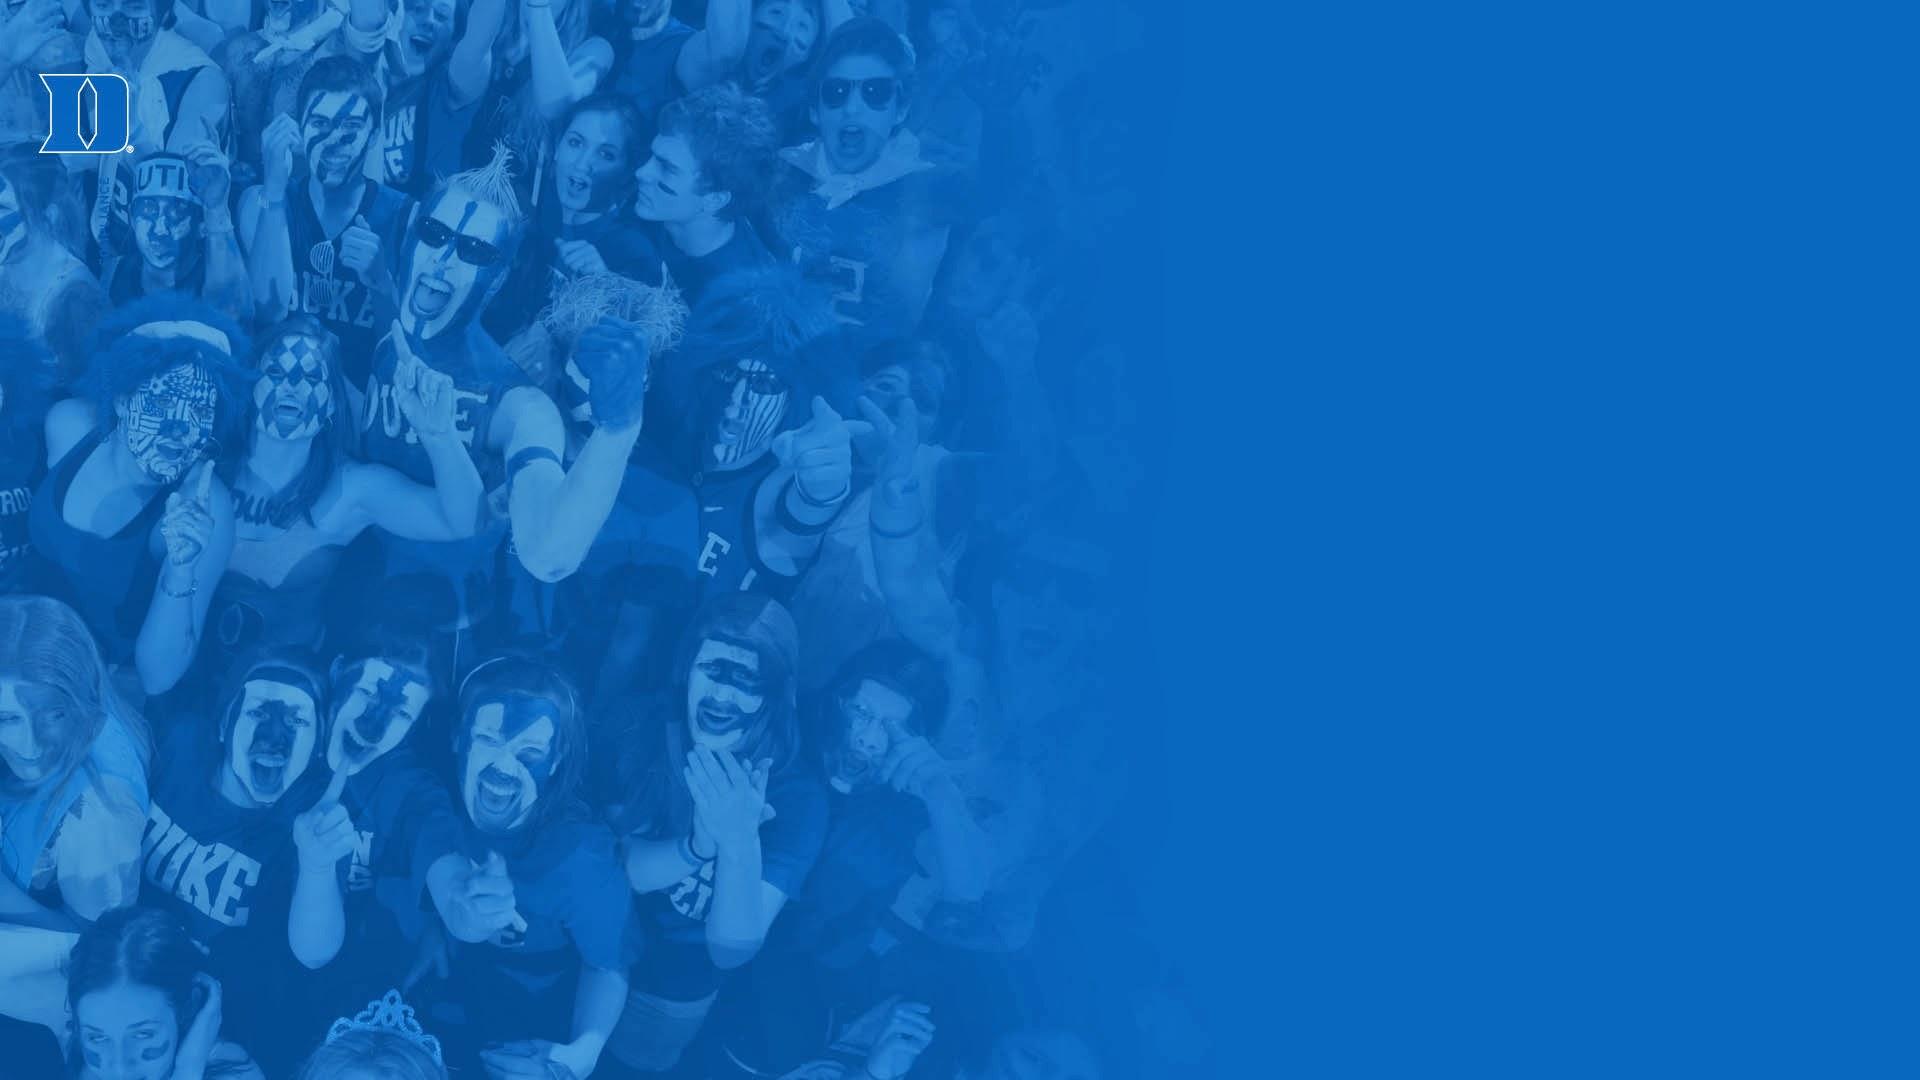 Duke University Background Backgroundjpg 1920x1080